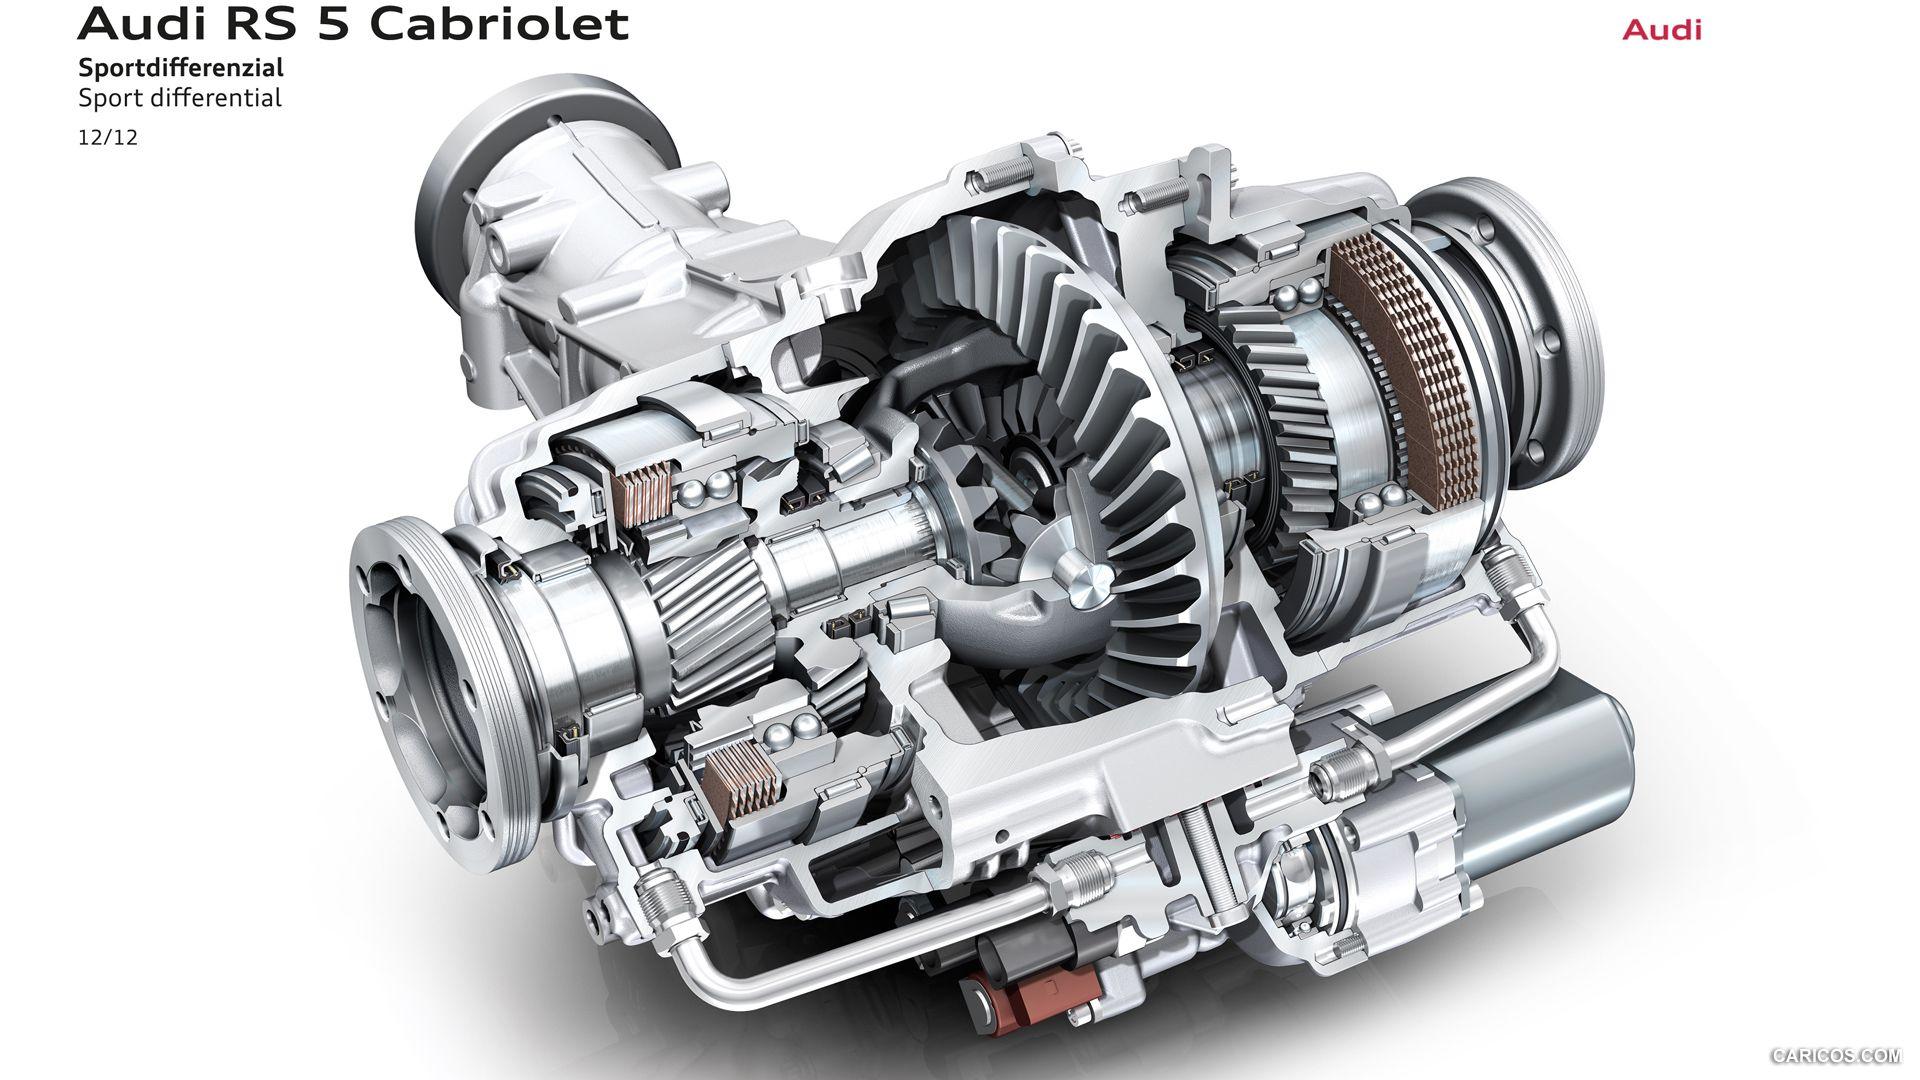 2014 Audi Rs5 Cabriolet Sport Differential Hd Audi Audi Rs 5 Audi Rs5